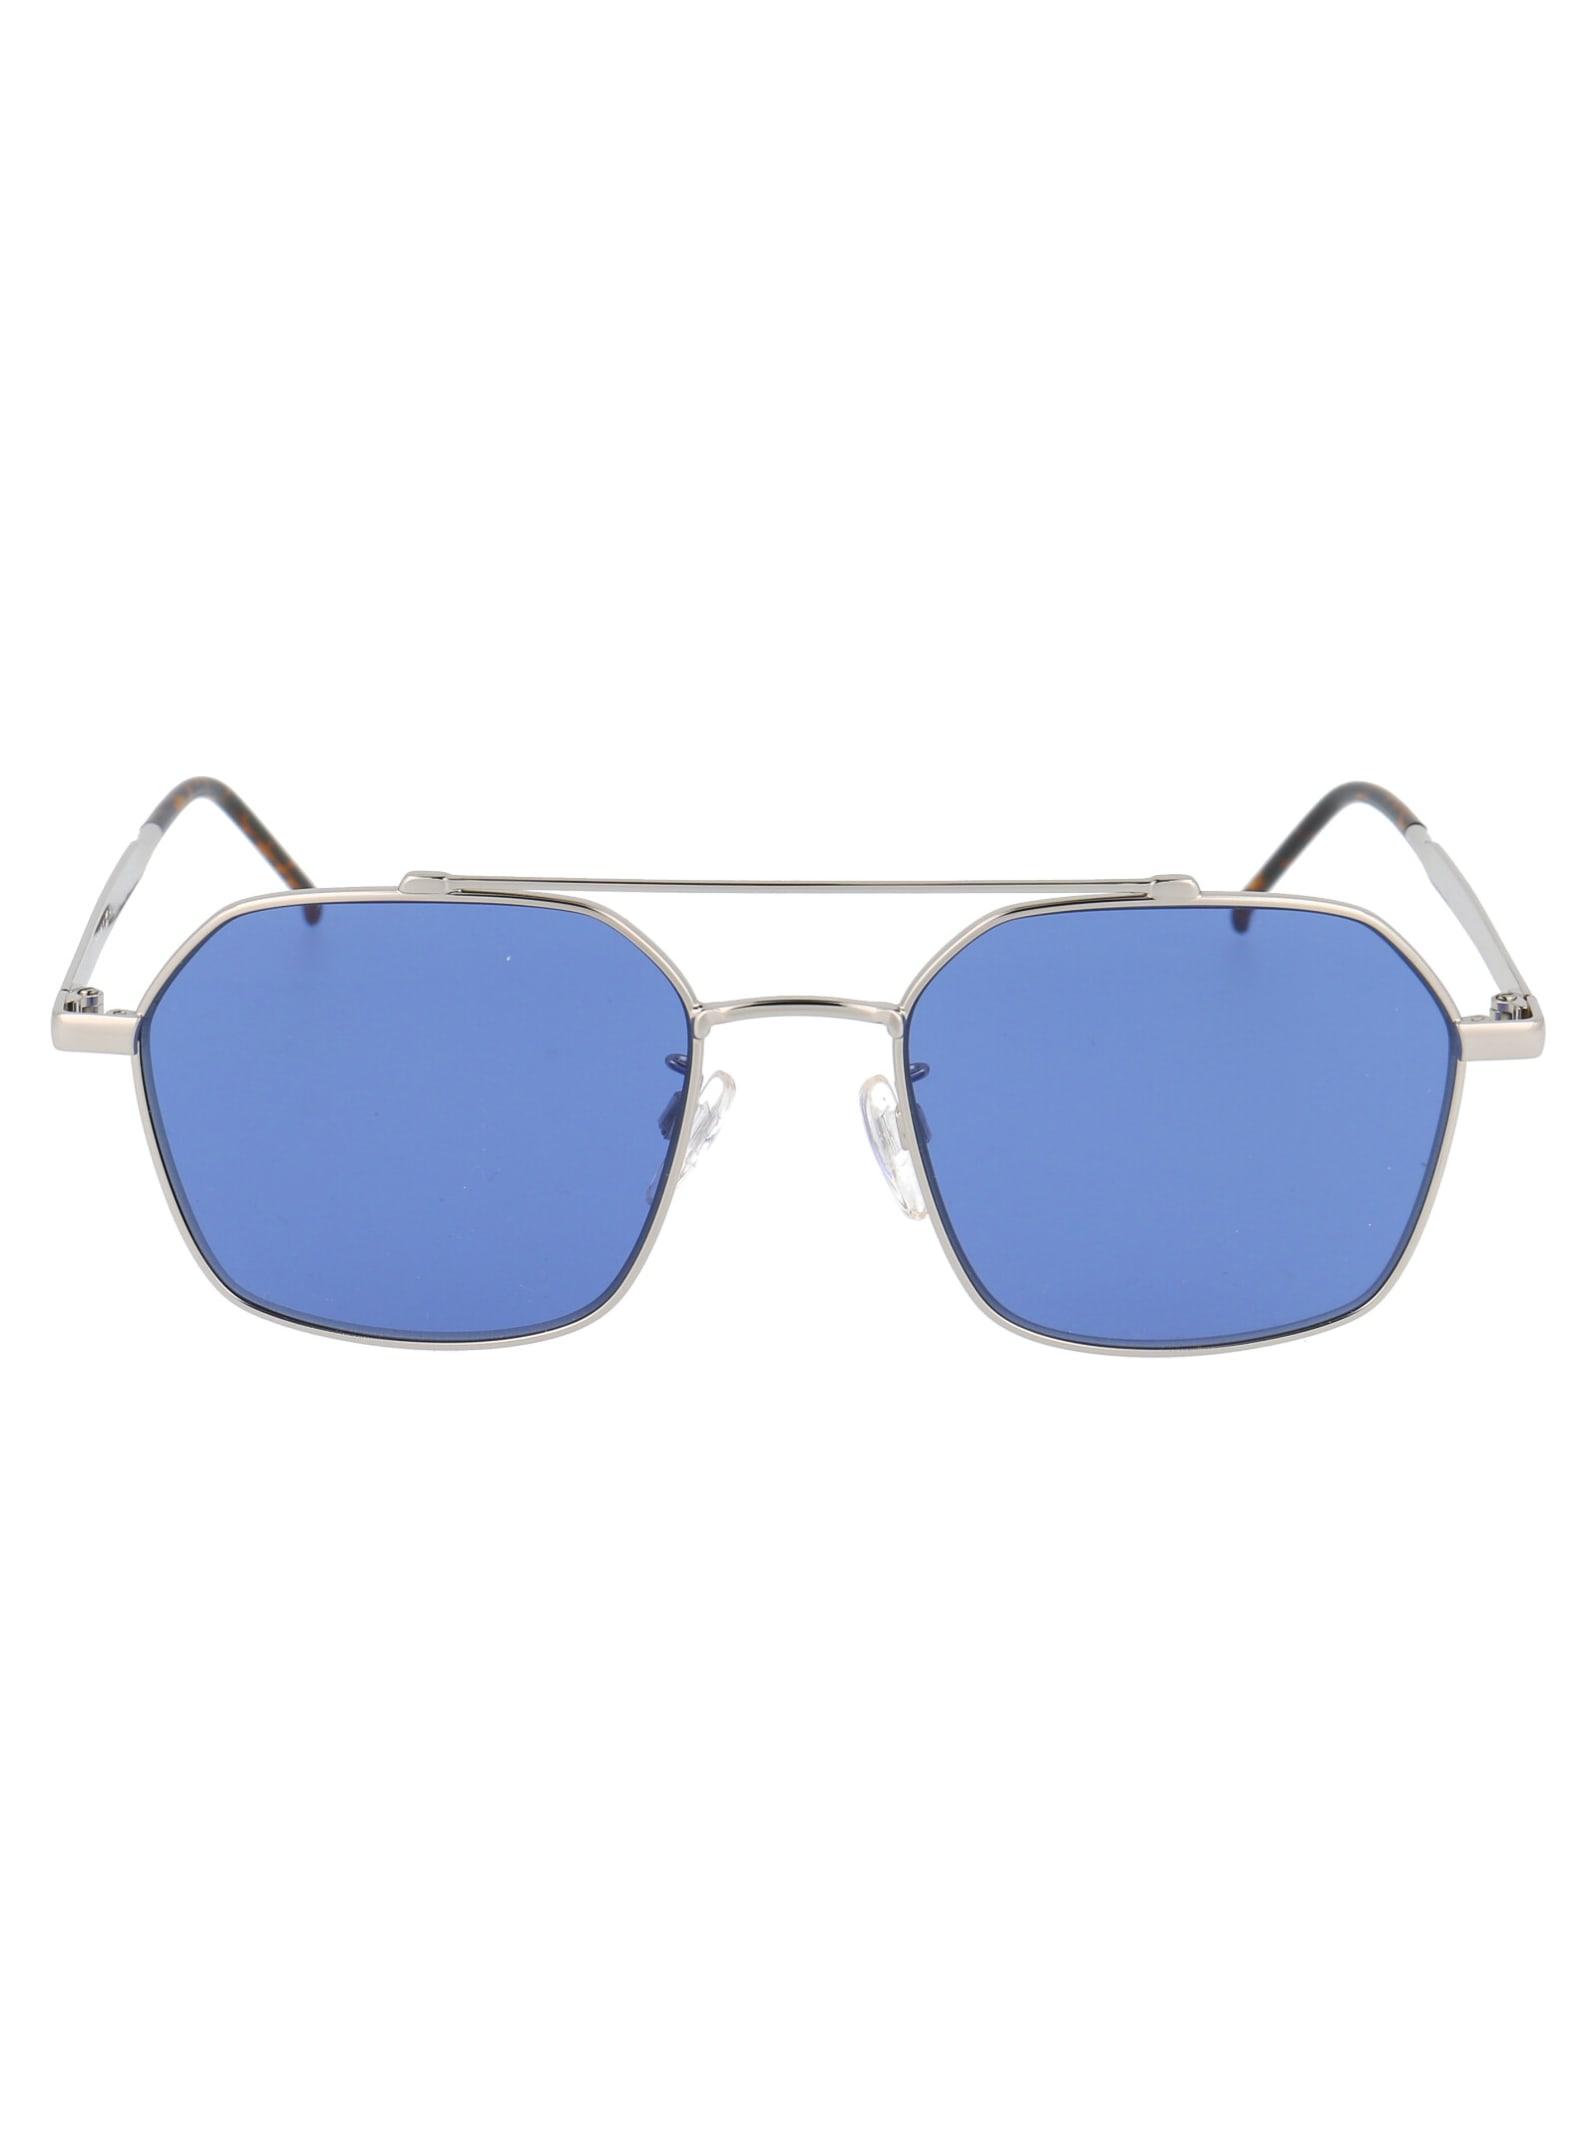 Th 1676/g/s Sunglasses